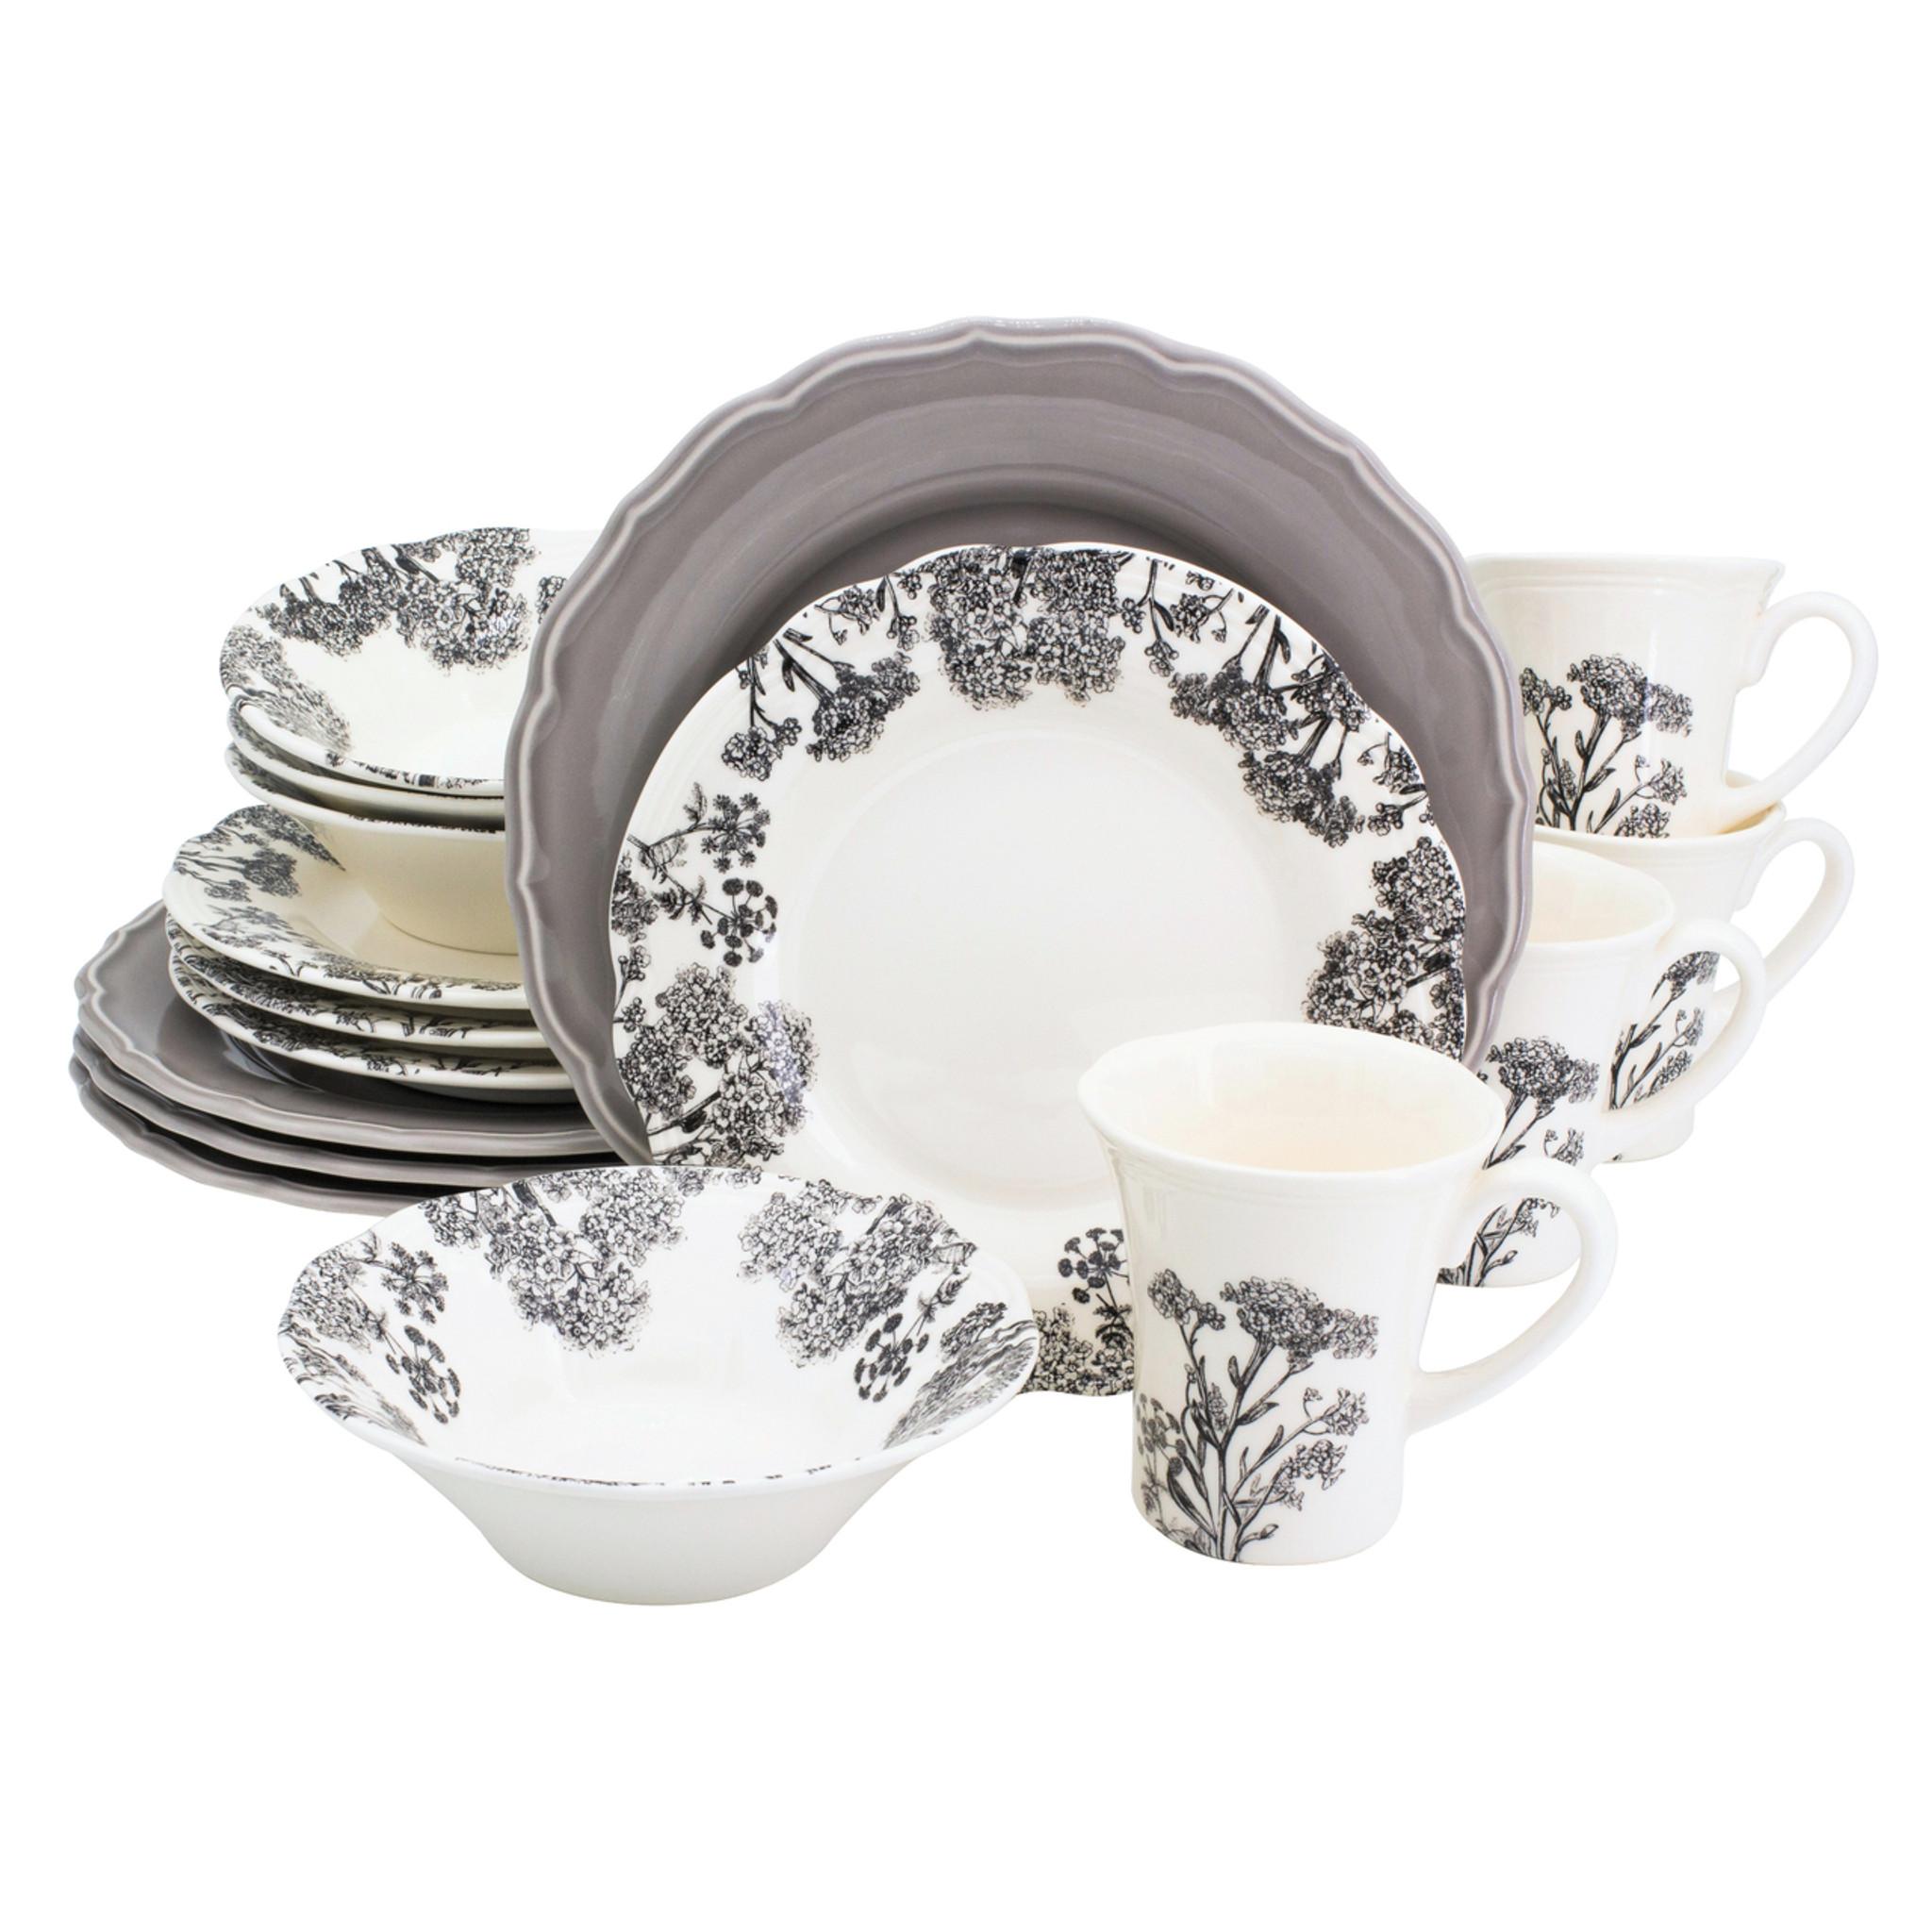 Savannah 16 Piece Dinnerware Set Service for 4  sc 1 st  Euro Ceramica & Savannah 16 Piece Dinnerware Set Service for 4 - Euro Ceramica